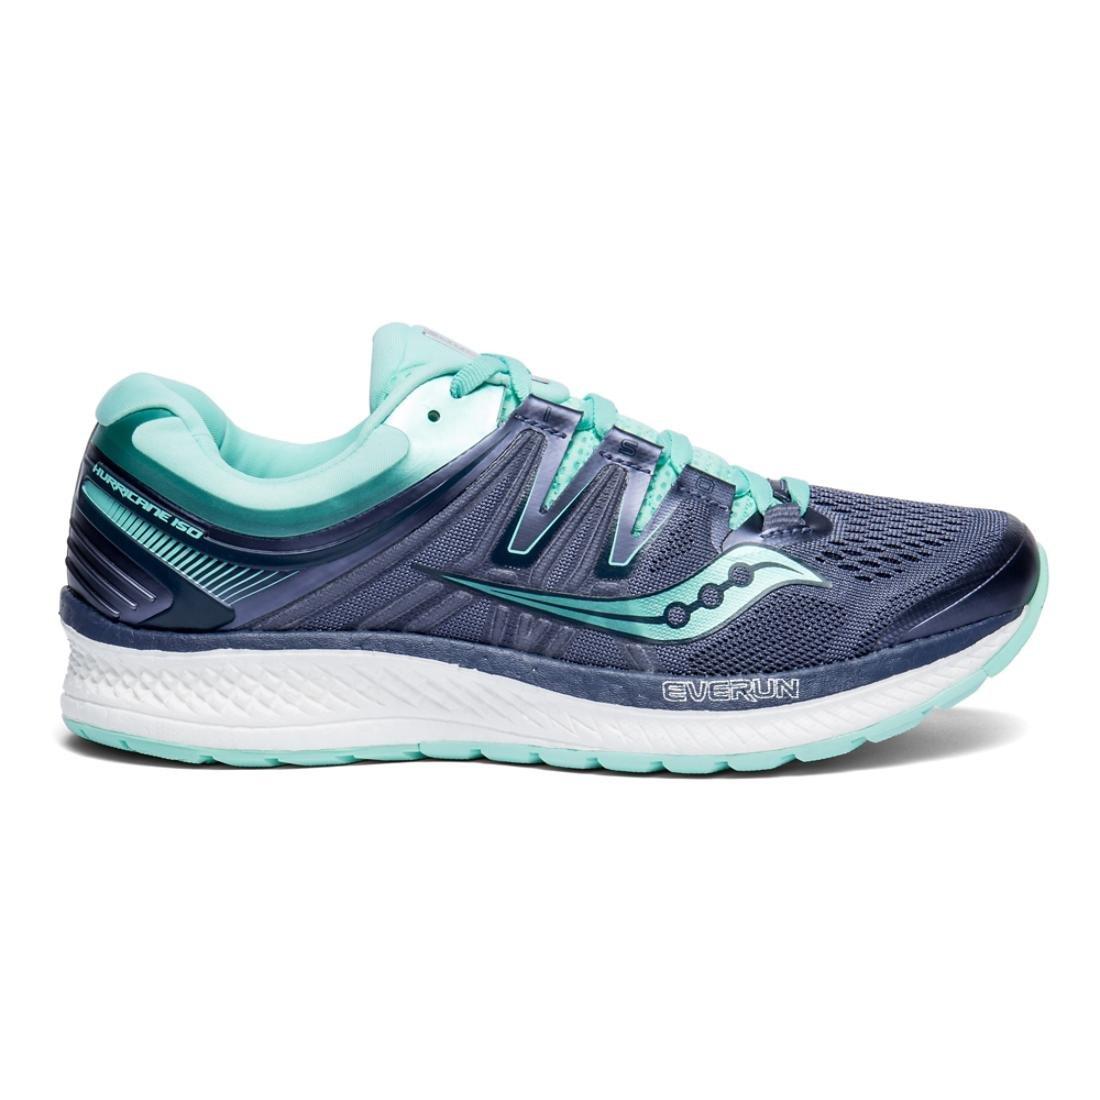 Saucony Women's Hurricane Iso 4 Running US|Grey/Aqua Shoe B078PNWKWR 11 B(M) US|Grey/Aqua Running ee1215